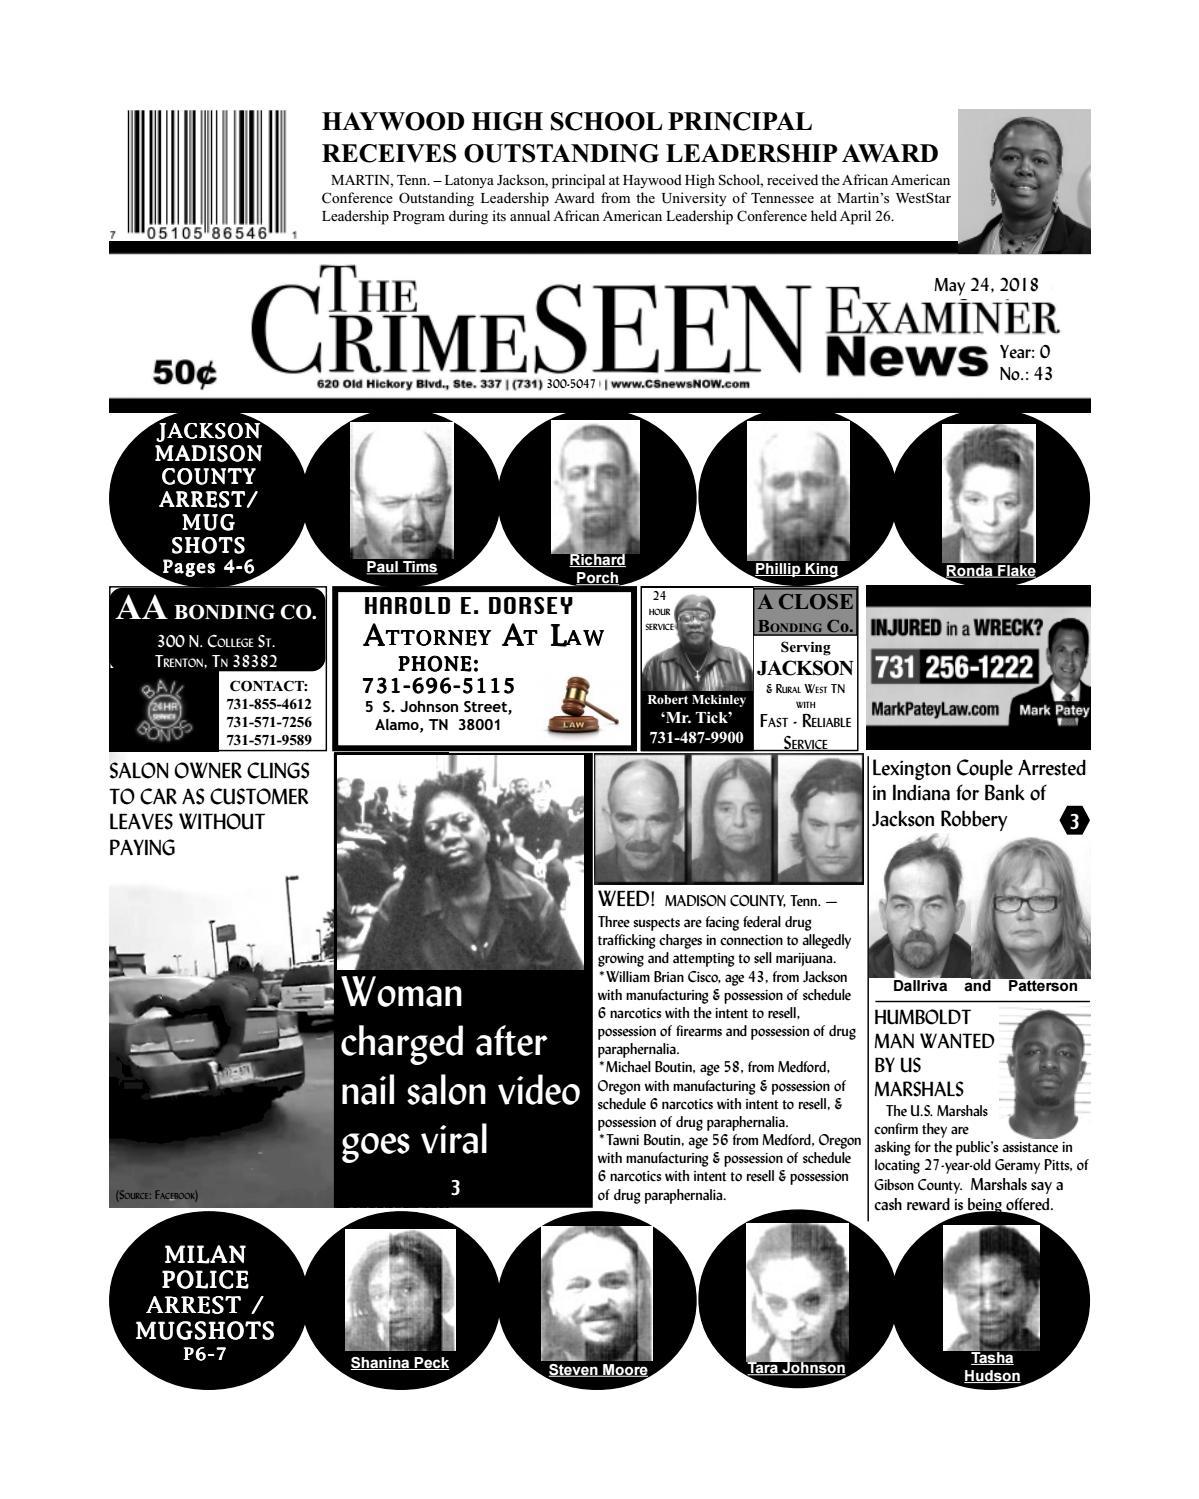 The CrimeSEEN Examiner News May 24, 2018 by CrimeSEEN